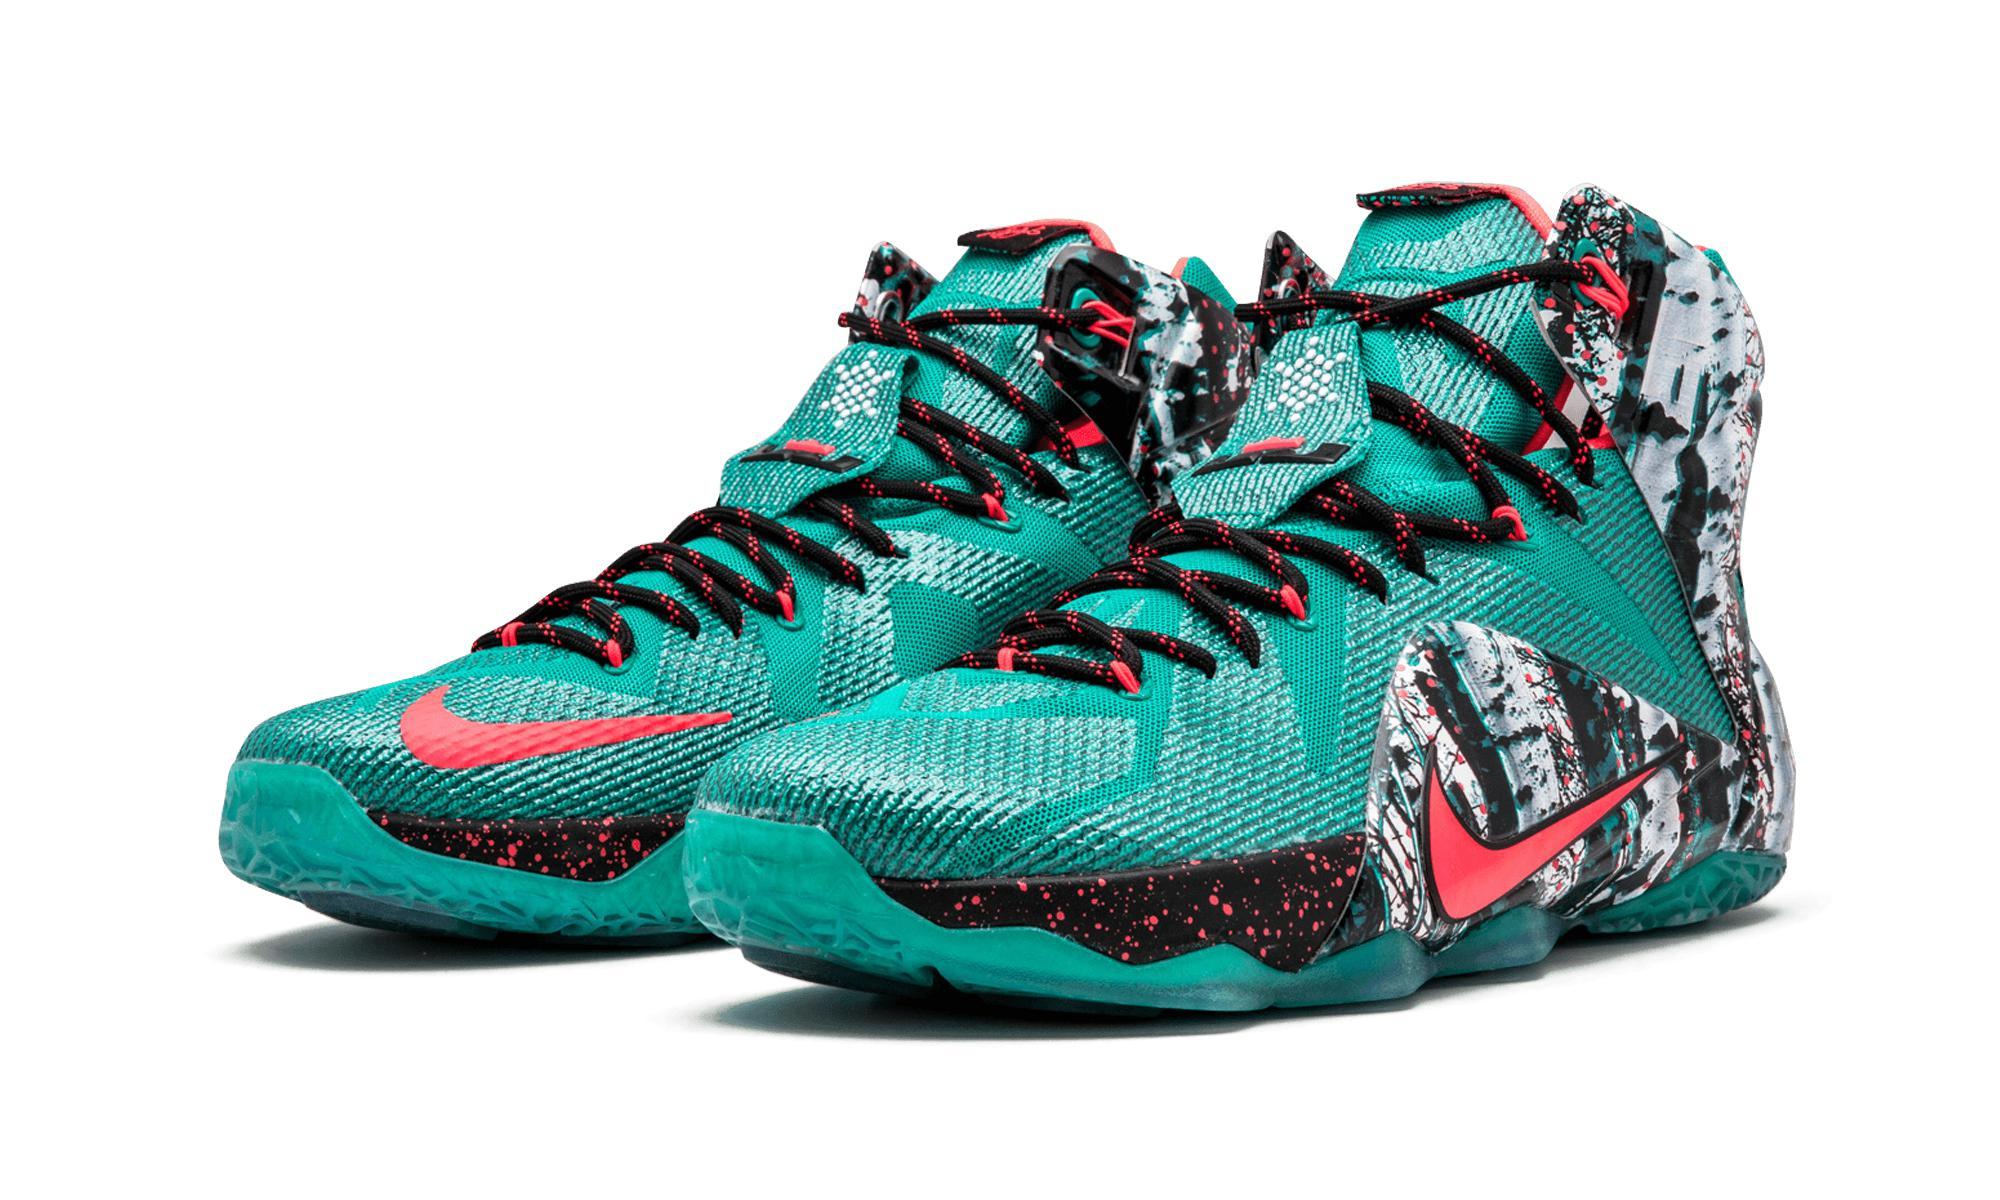 e9c5b067add6 Nike - Lebron 12 Xmas Emerald Green hyper Punch for Men - Lyst. View  fullscreen